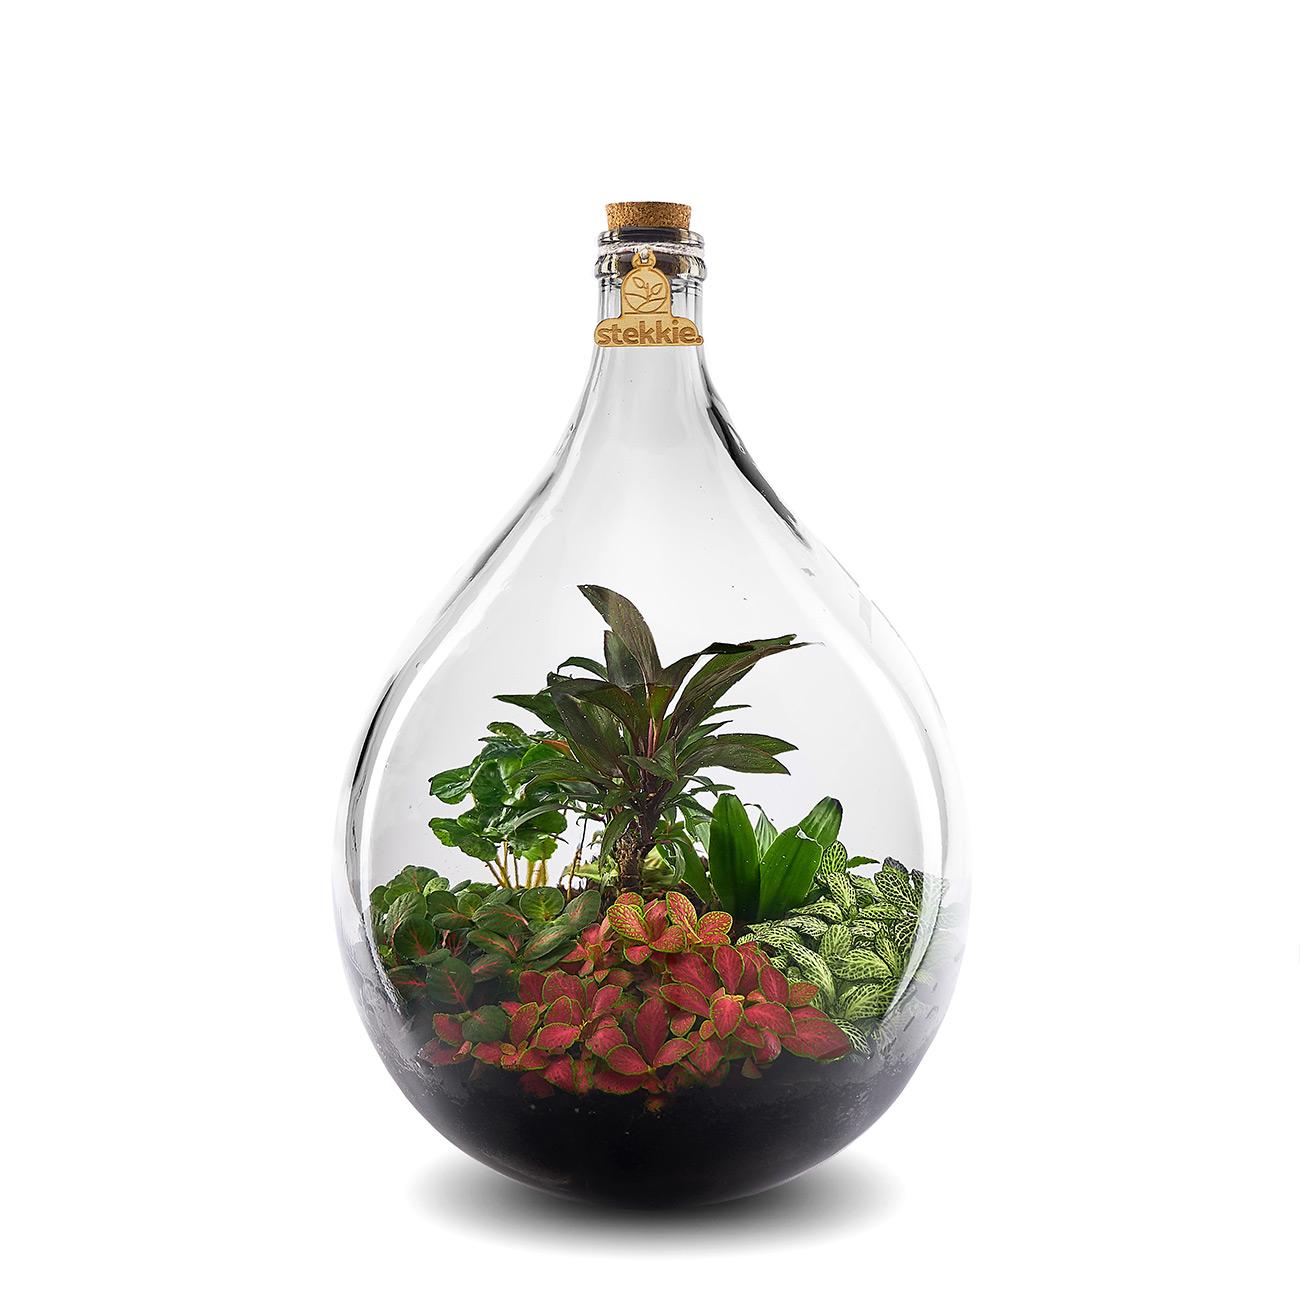 stekkie-large-rood-planten-terrarium